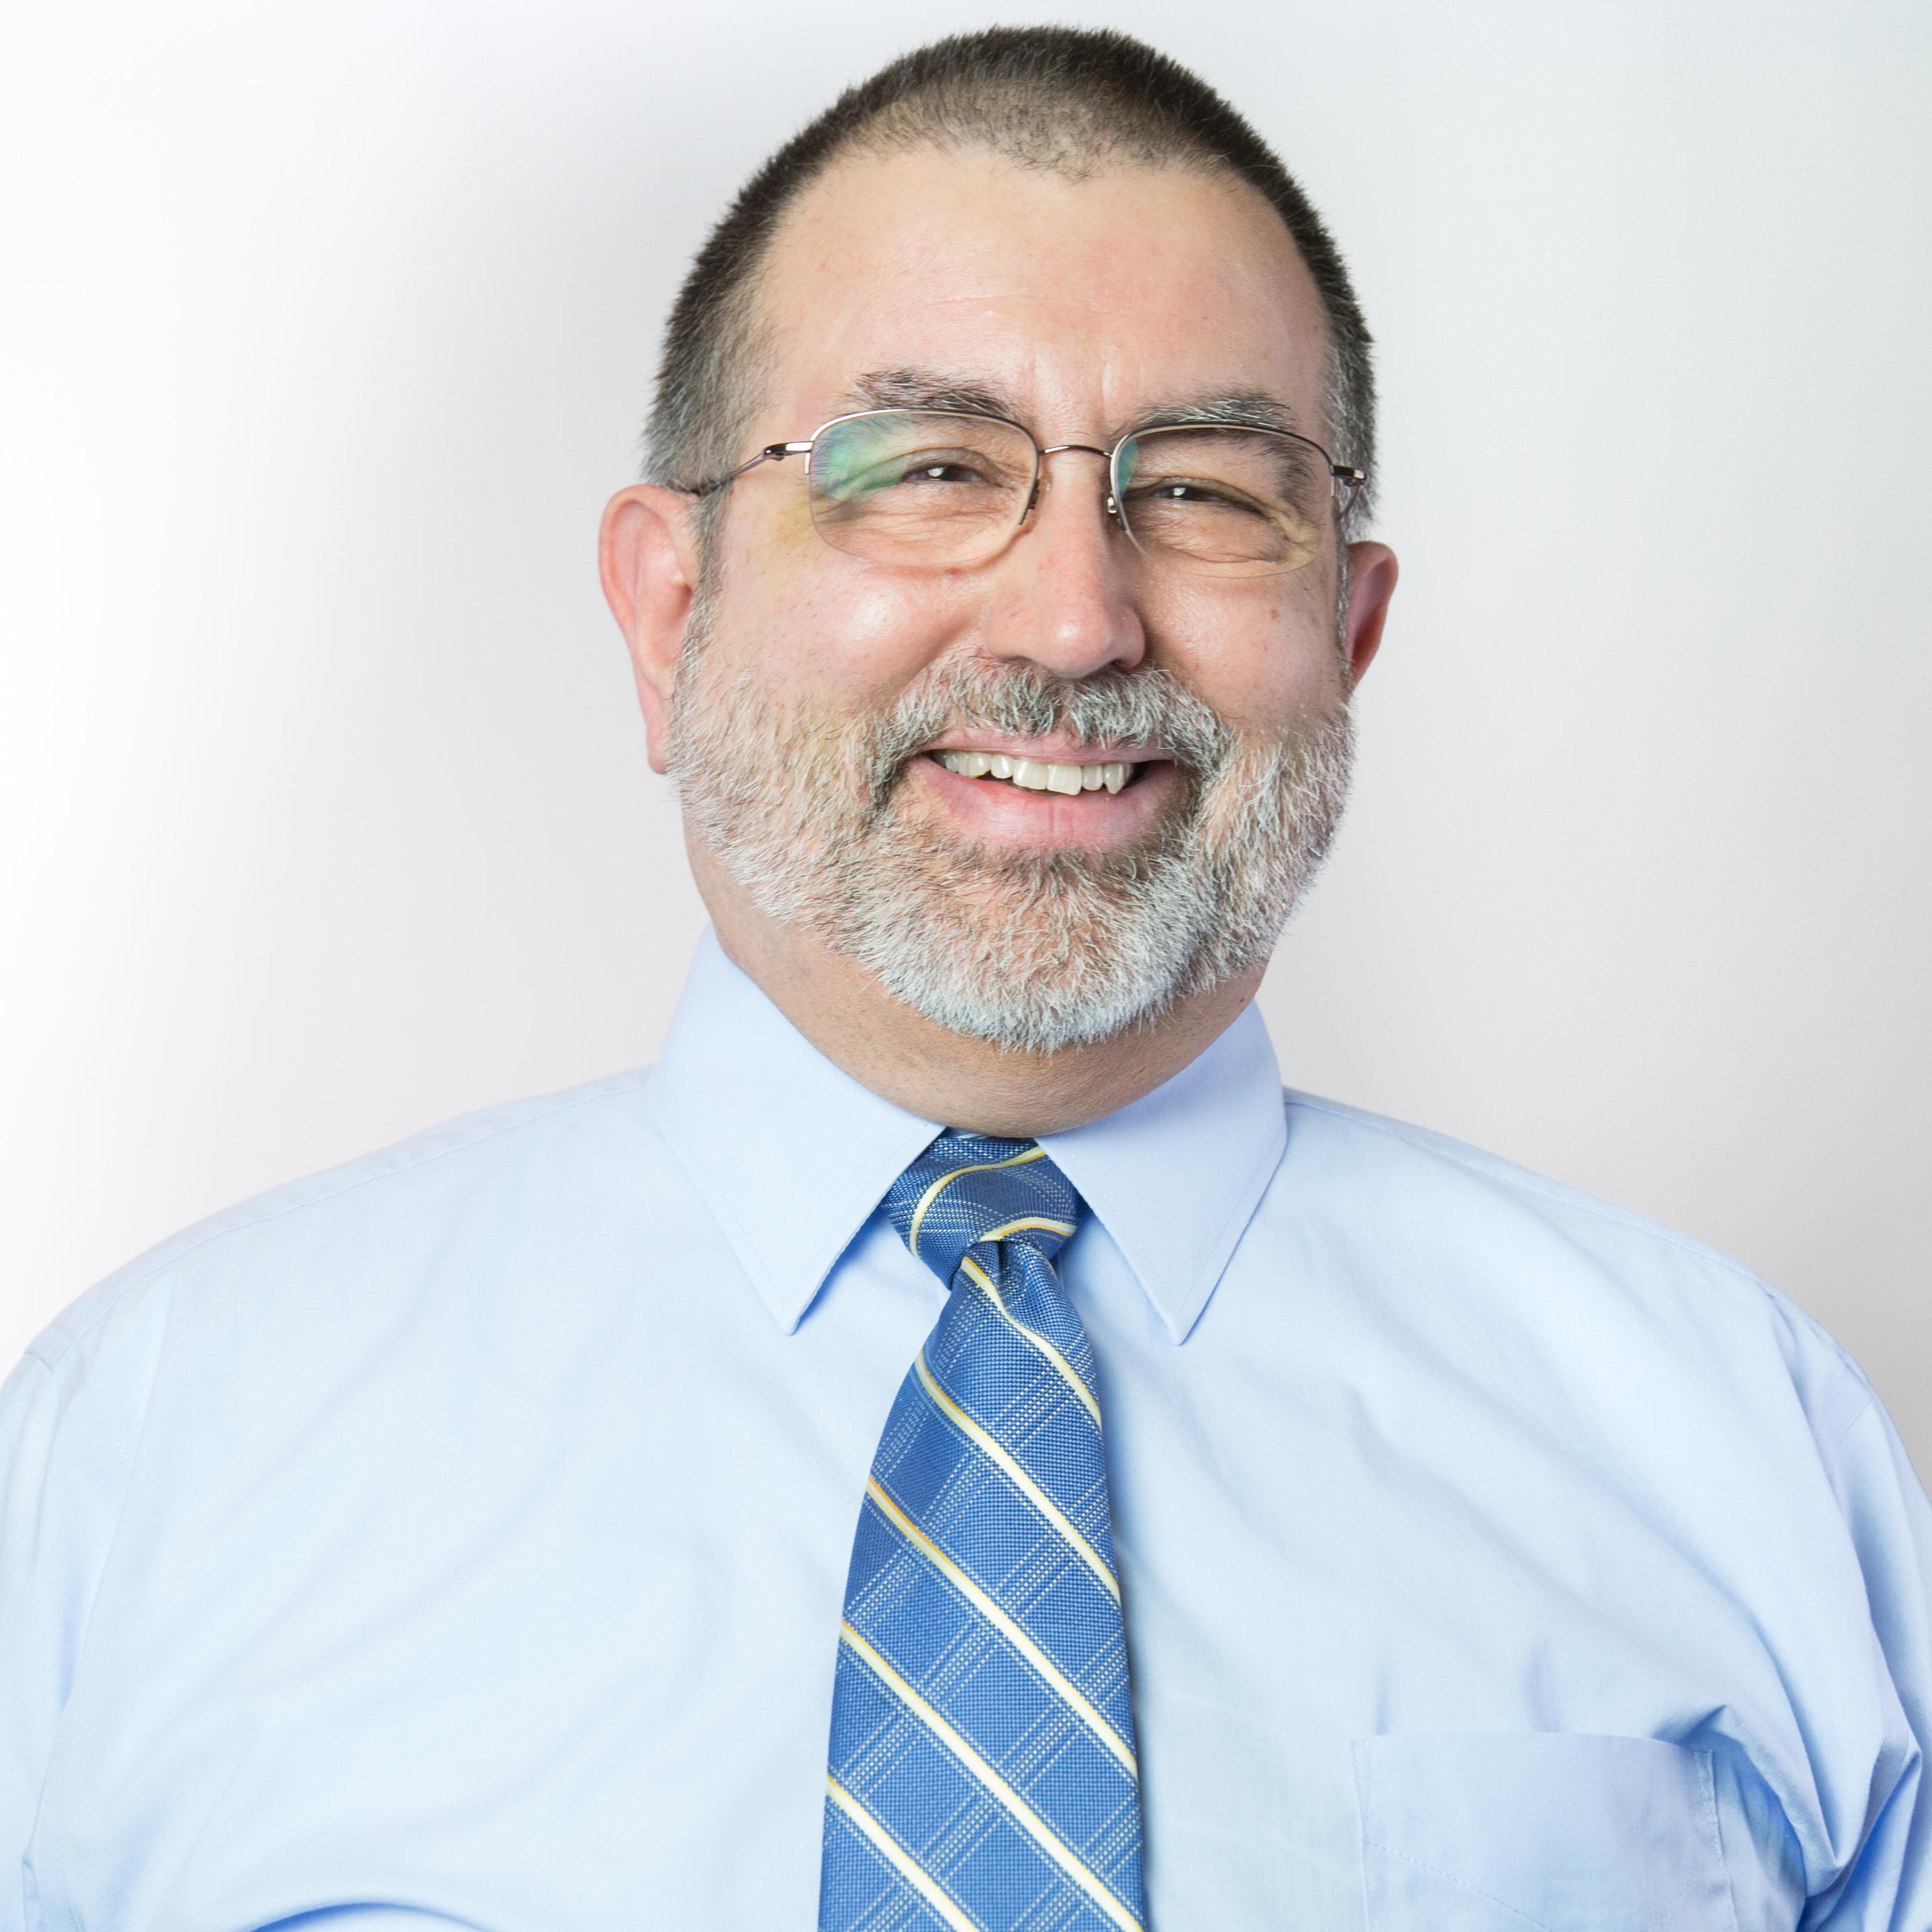 George Rader Optician